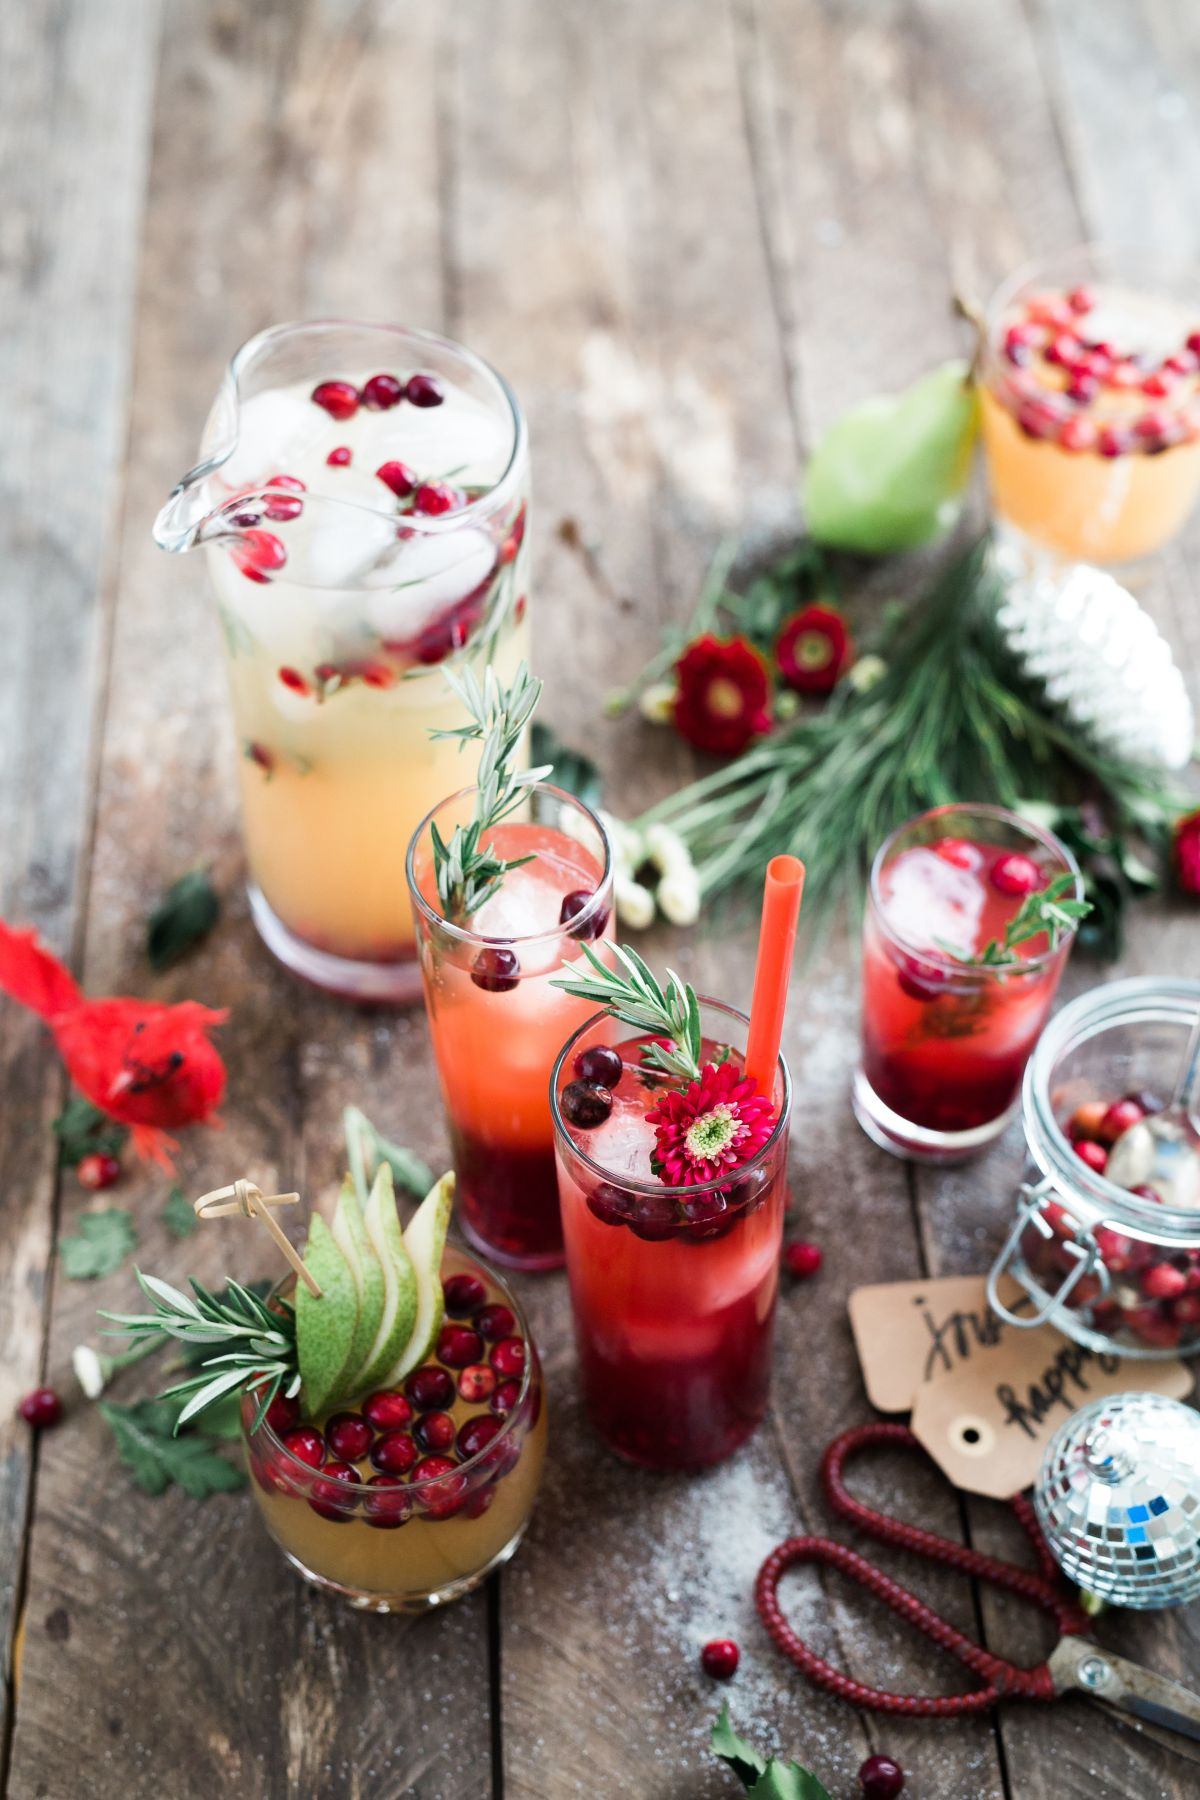 10 fabulously festive Christmas cocktails